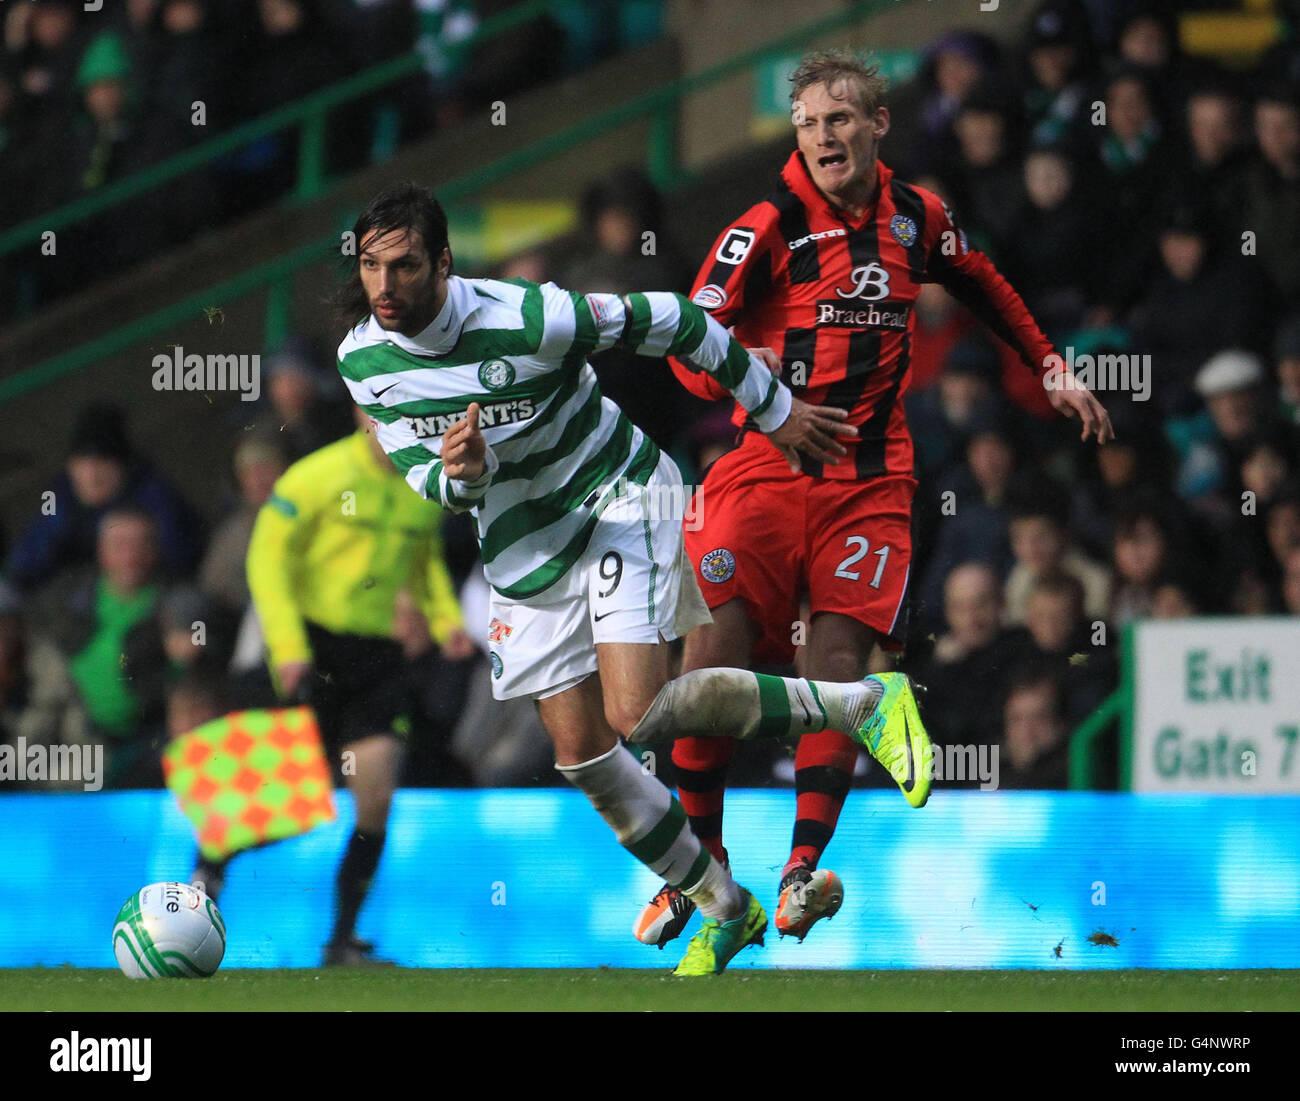 Soccer - Clydesdale Bank Scottish Premier League - Celtic v St Mirren - Celtic Park - Stock Image